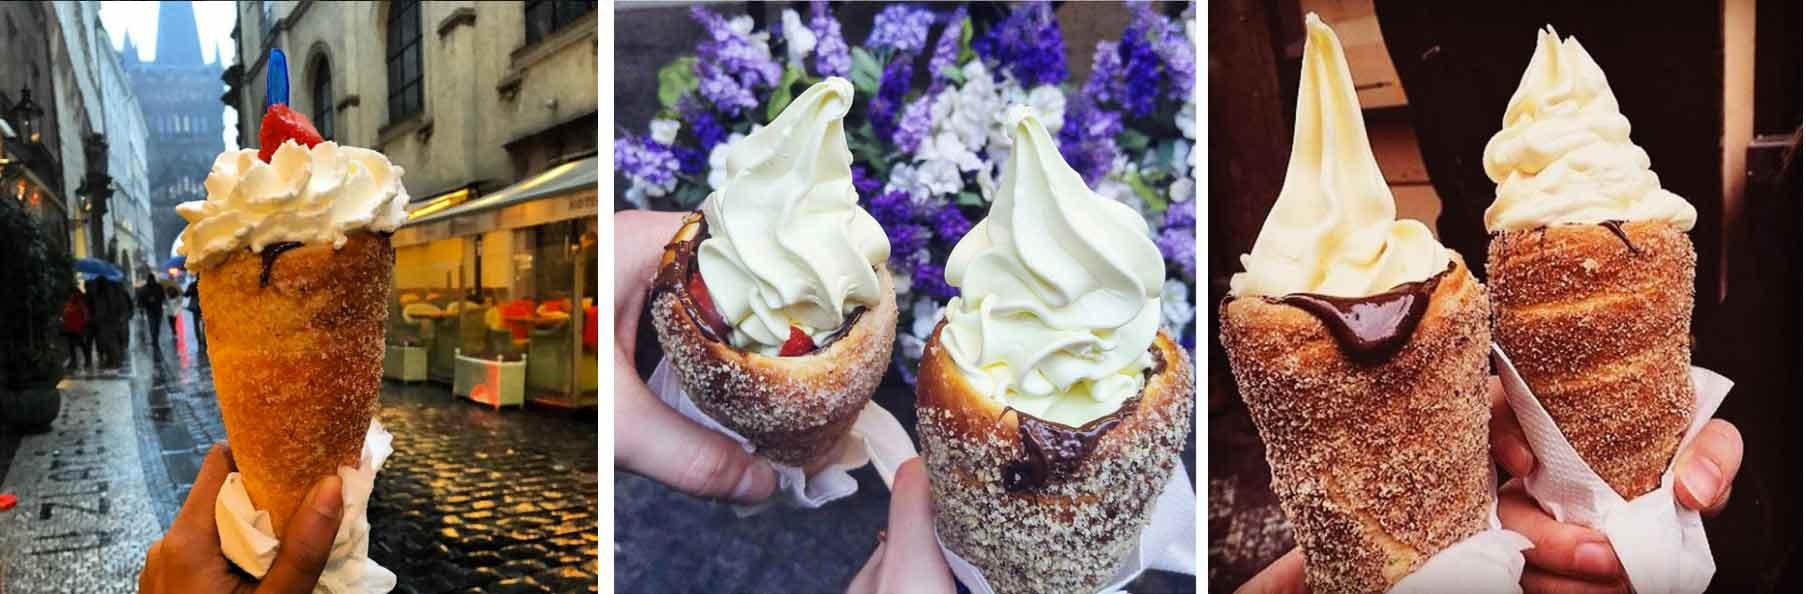 Chimney-Cone-Donut